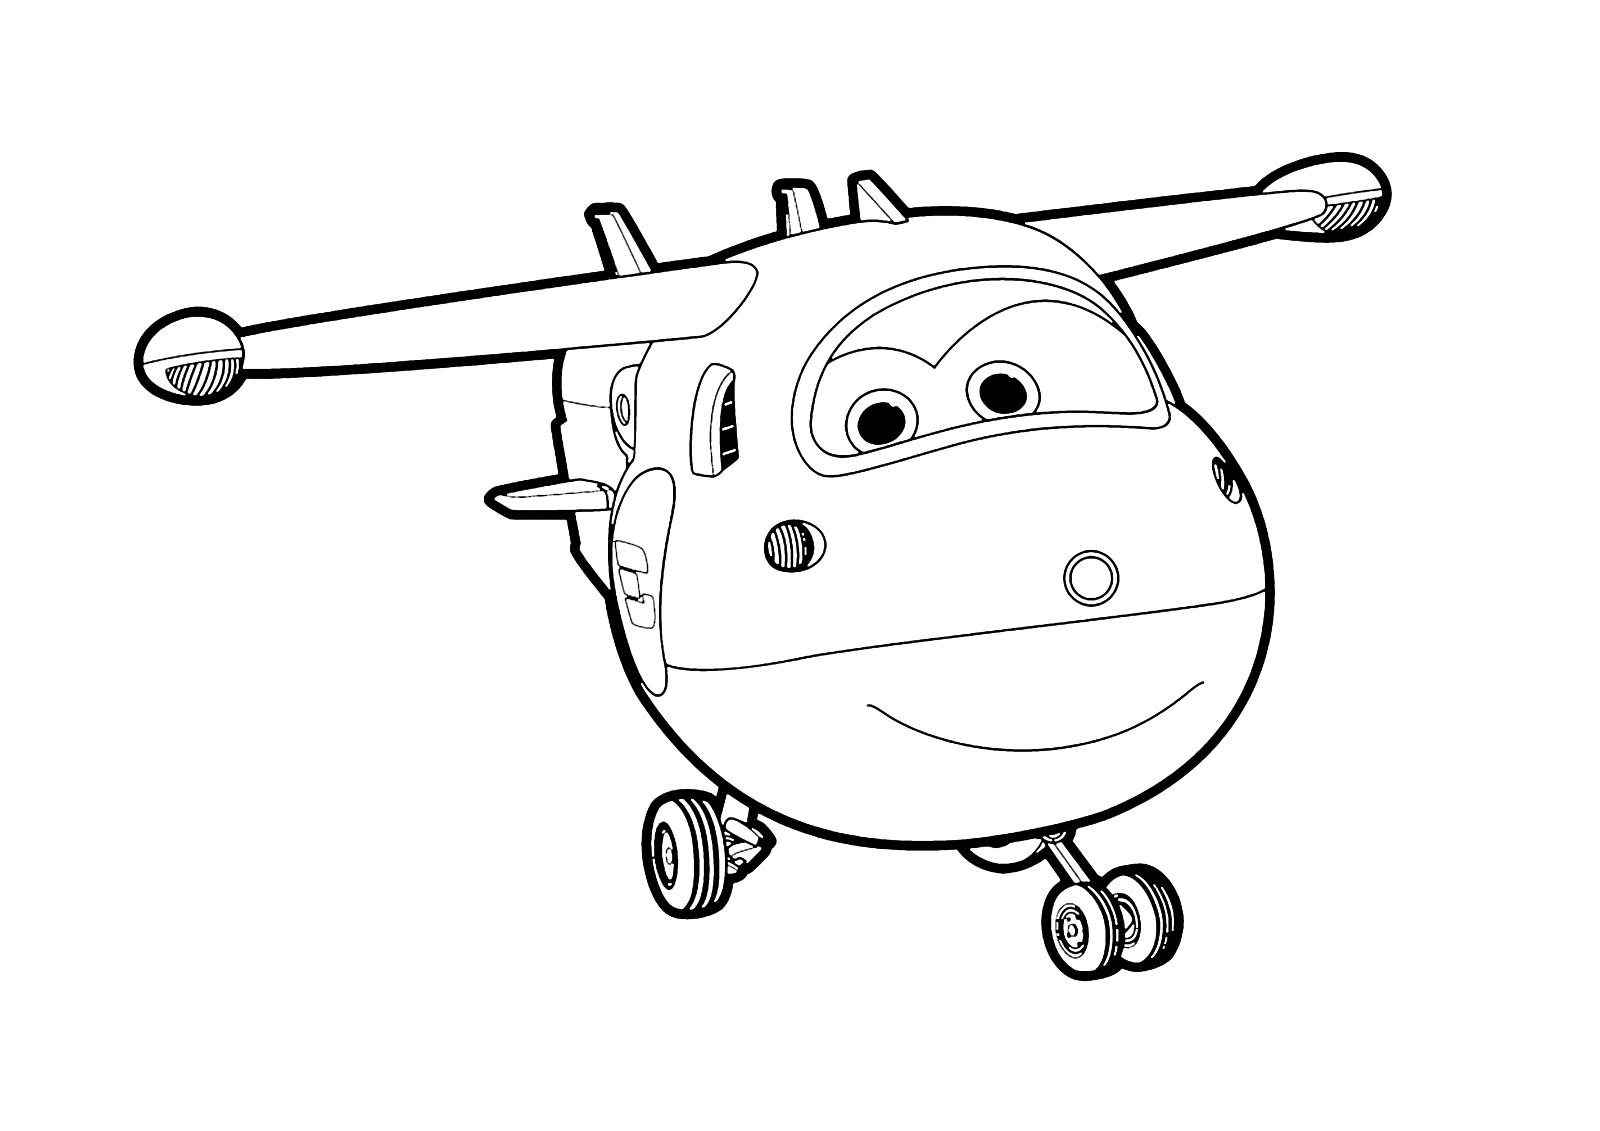 Super Wings Jett Vola Nel Cielo